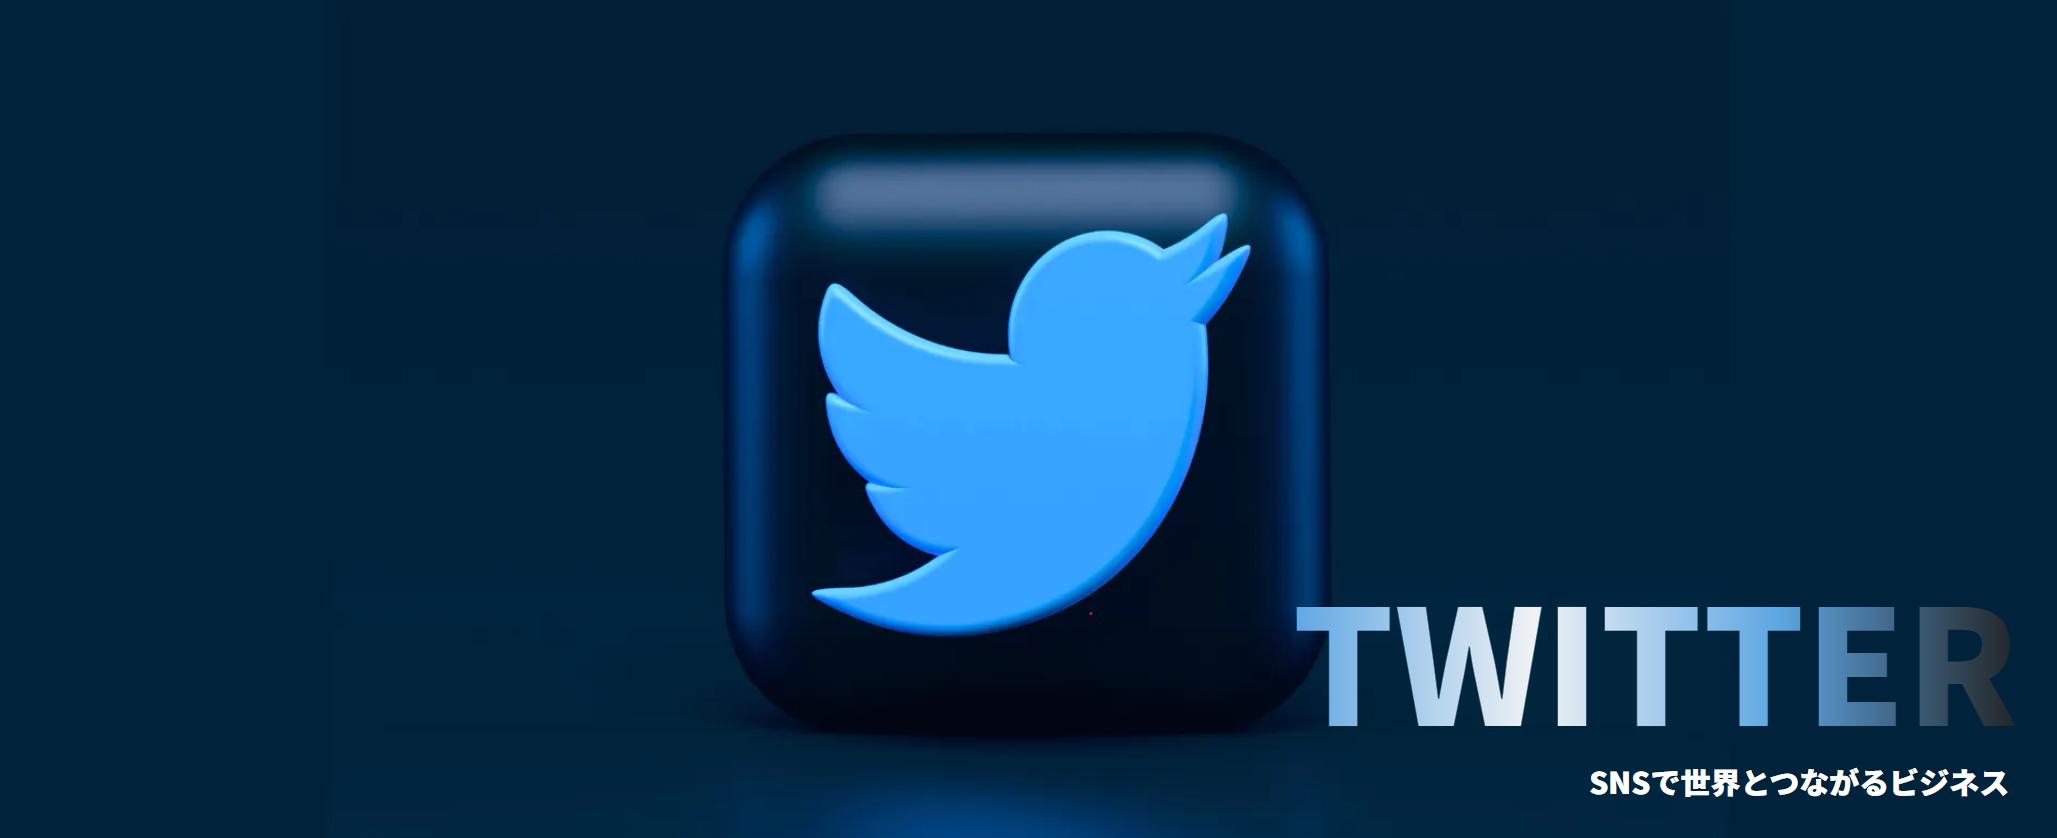 【Twitter × EC】ECマーケティングに繋がるTwitter運用代行サービス 「UnReact Twitter運用」を九州大学発のITベンチャー 株式会社UnReactがリリース